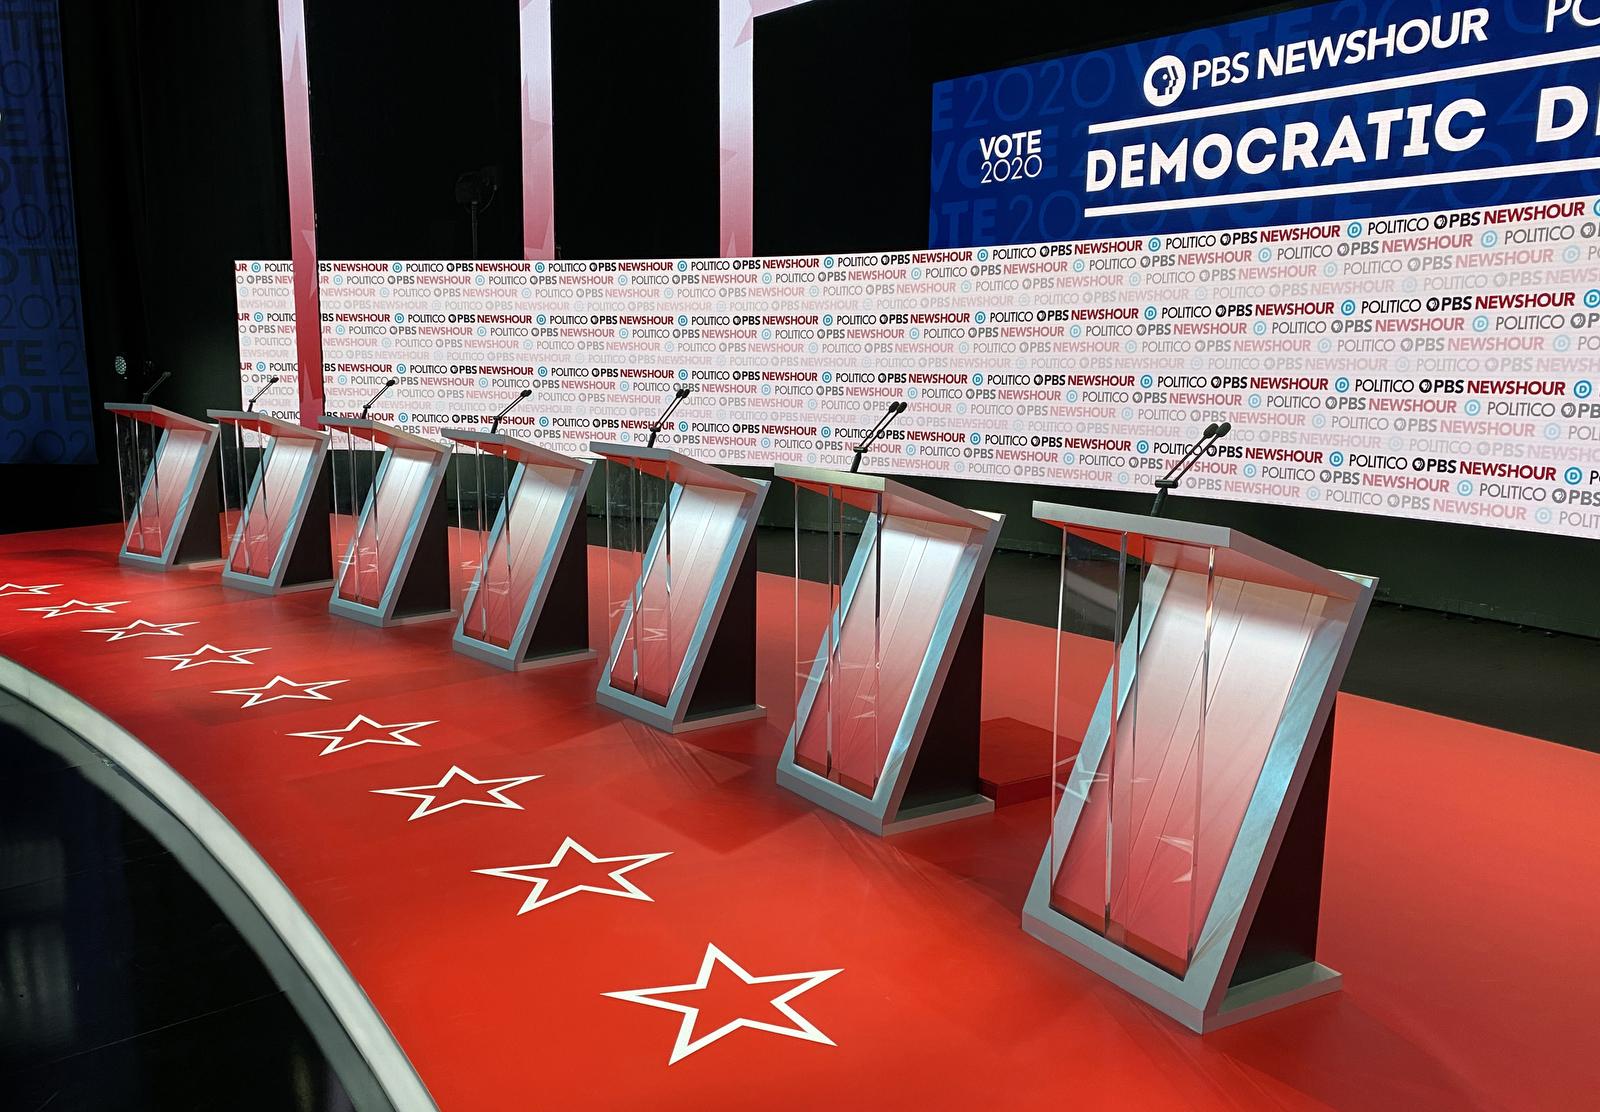 NCS_PBS-NewsHour_Politico_Democratic-Debate_004